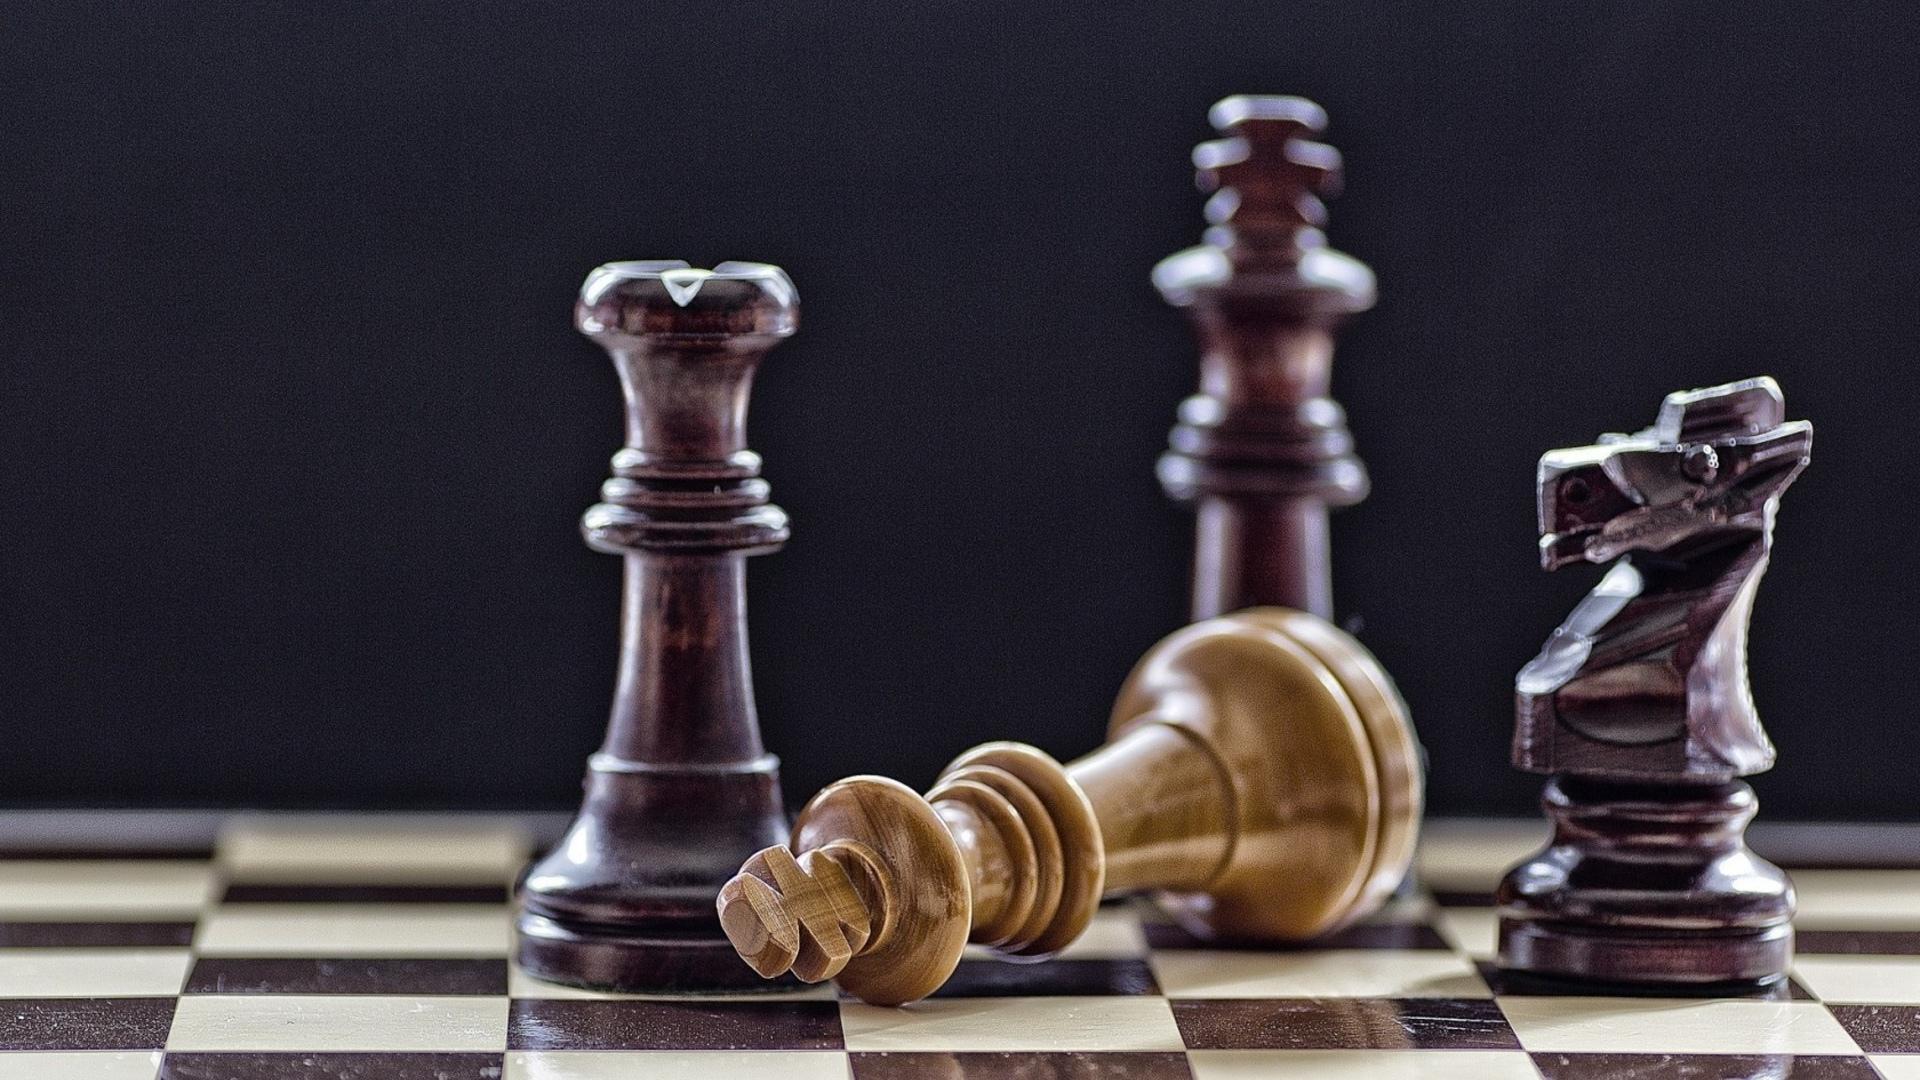 chess_board_1920x1080